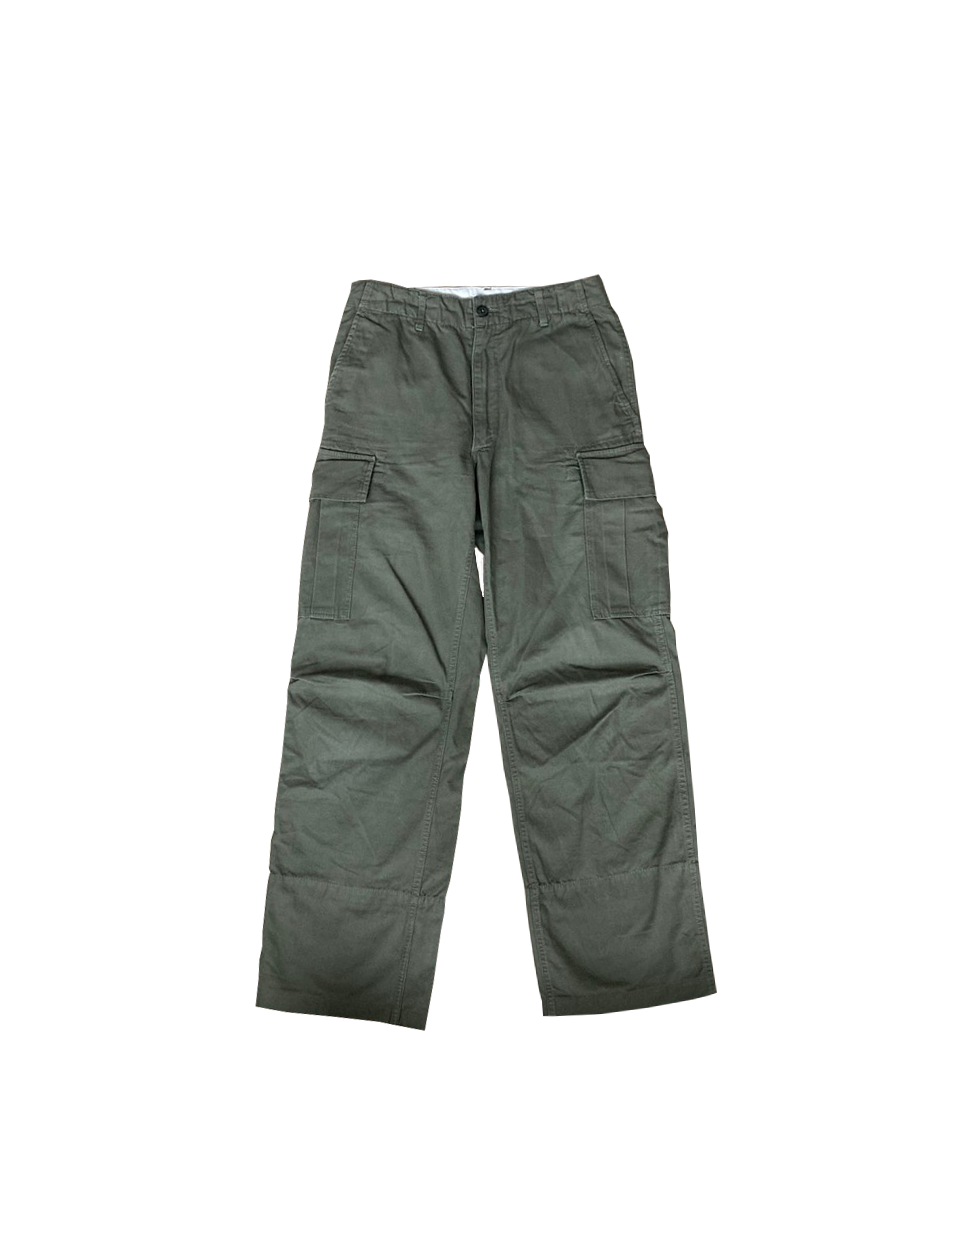 Engineered Garments New York Cargo Pants